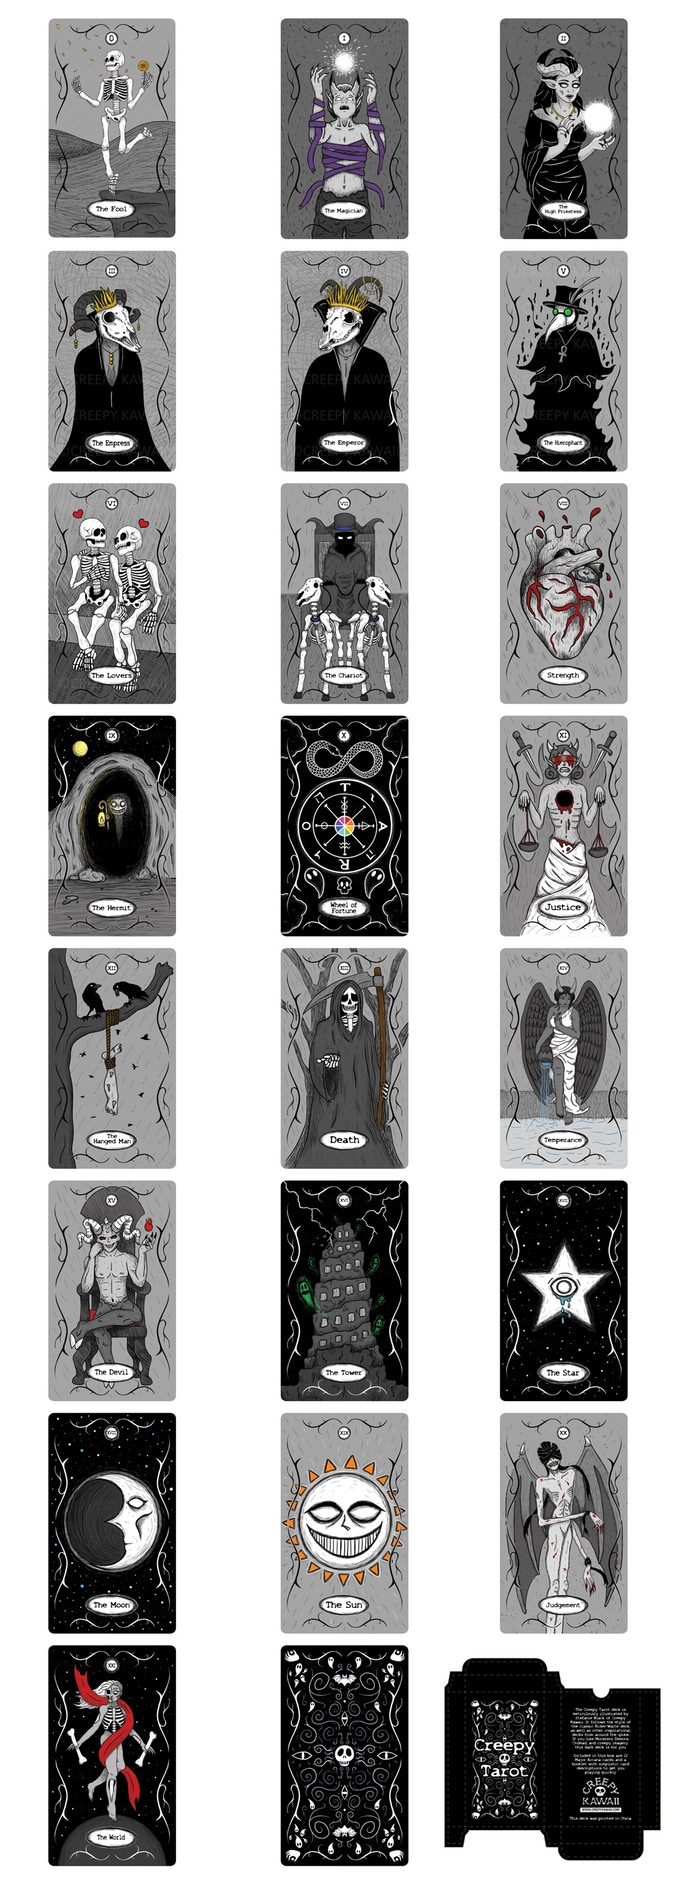 The Creepy Tarot Deck